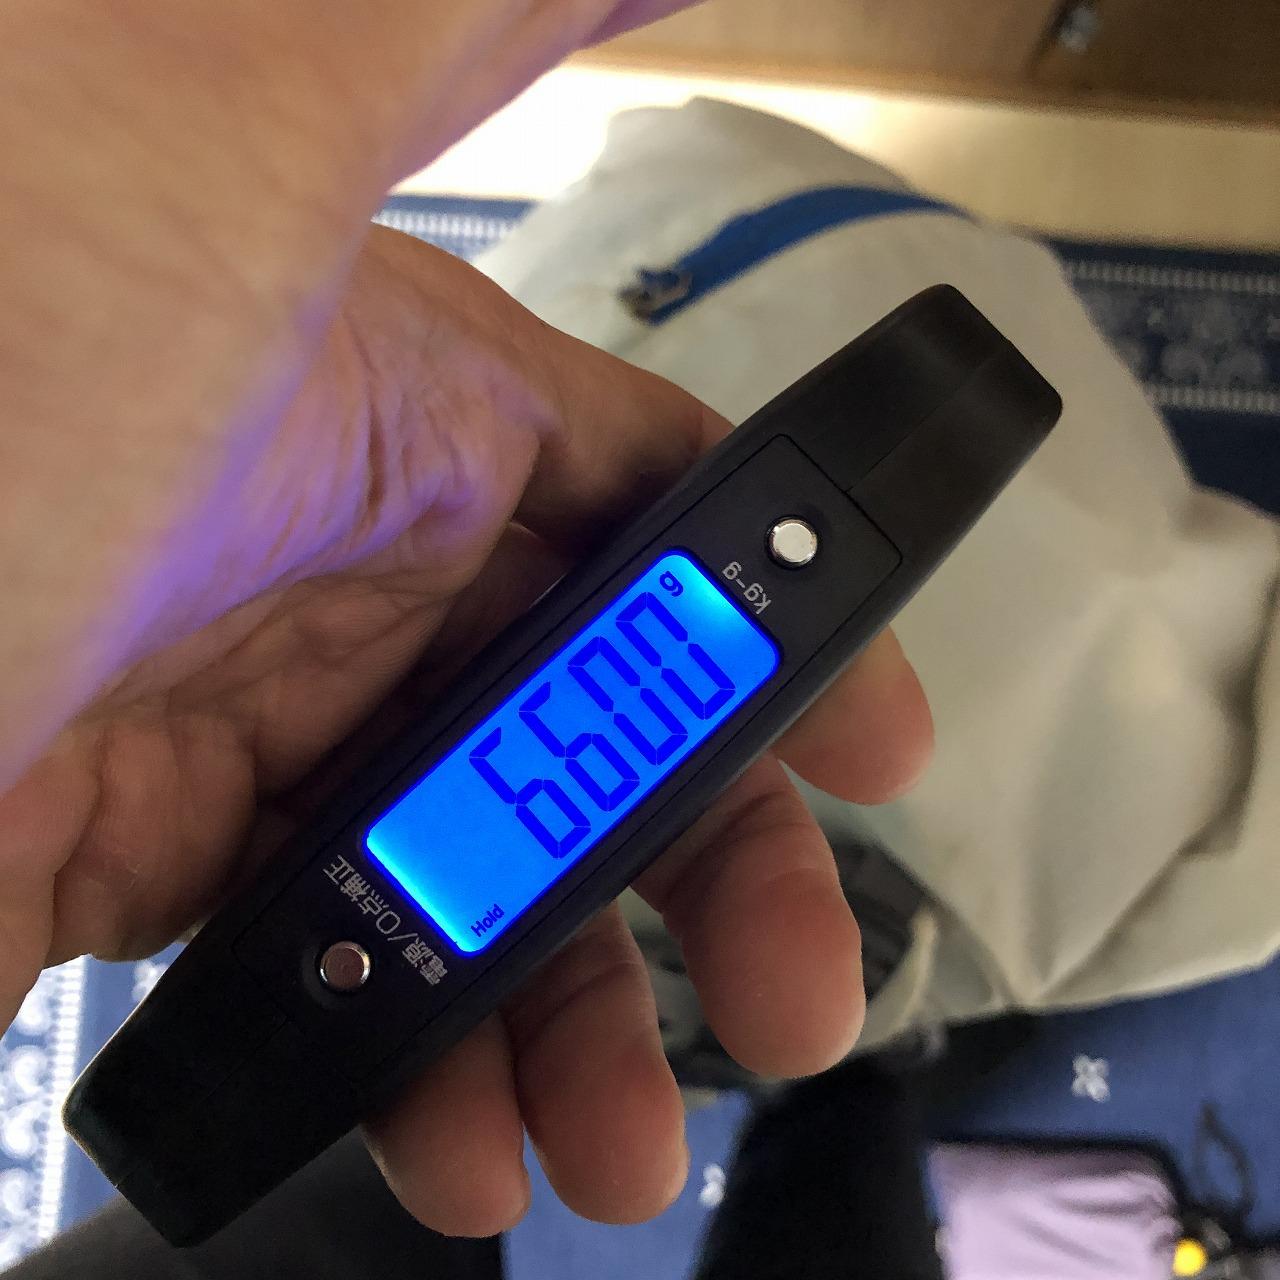 6.6kg!